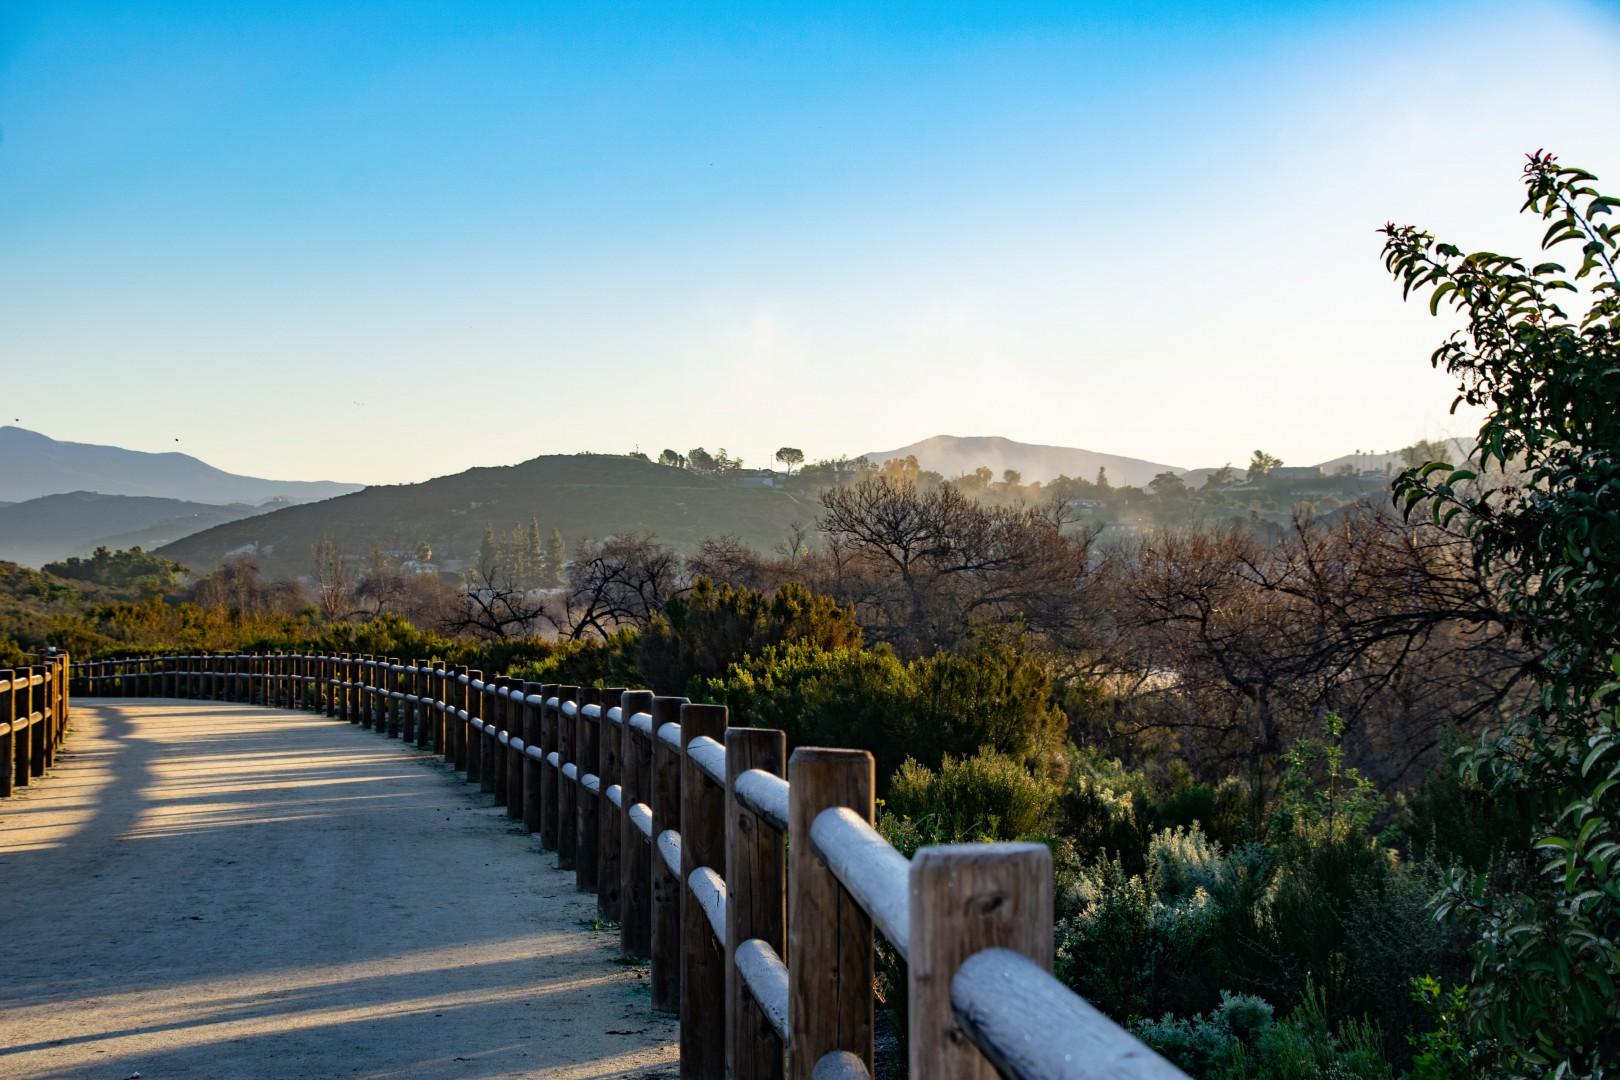 Mountain view scenery in El Cajon County California